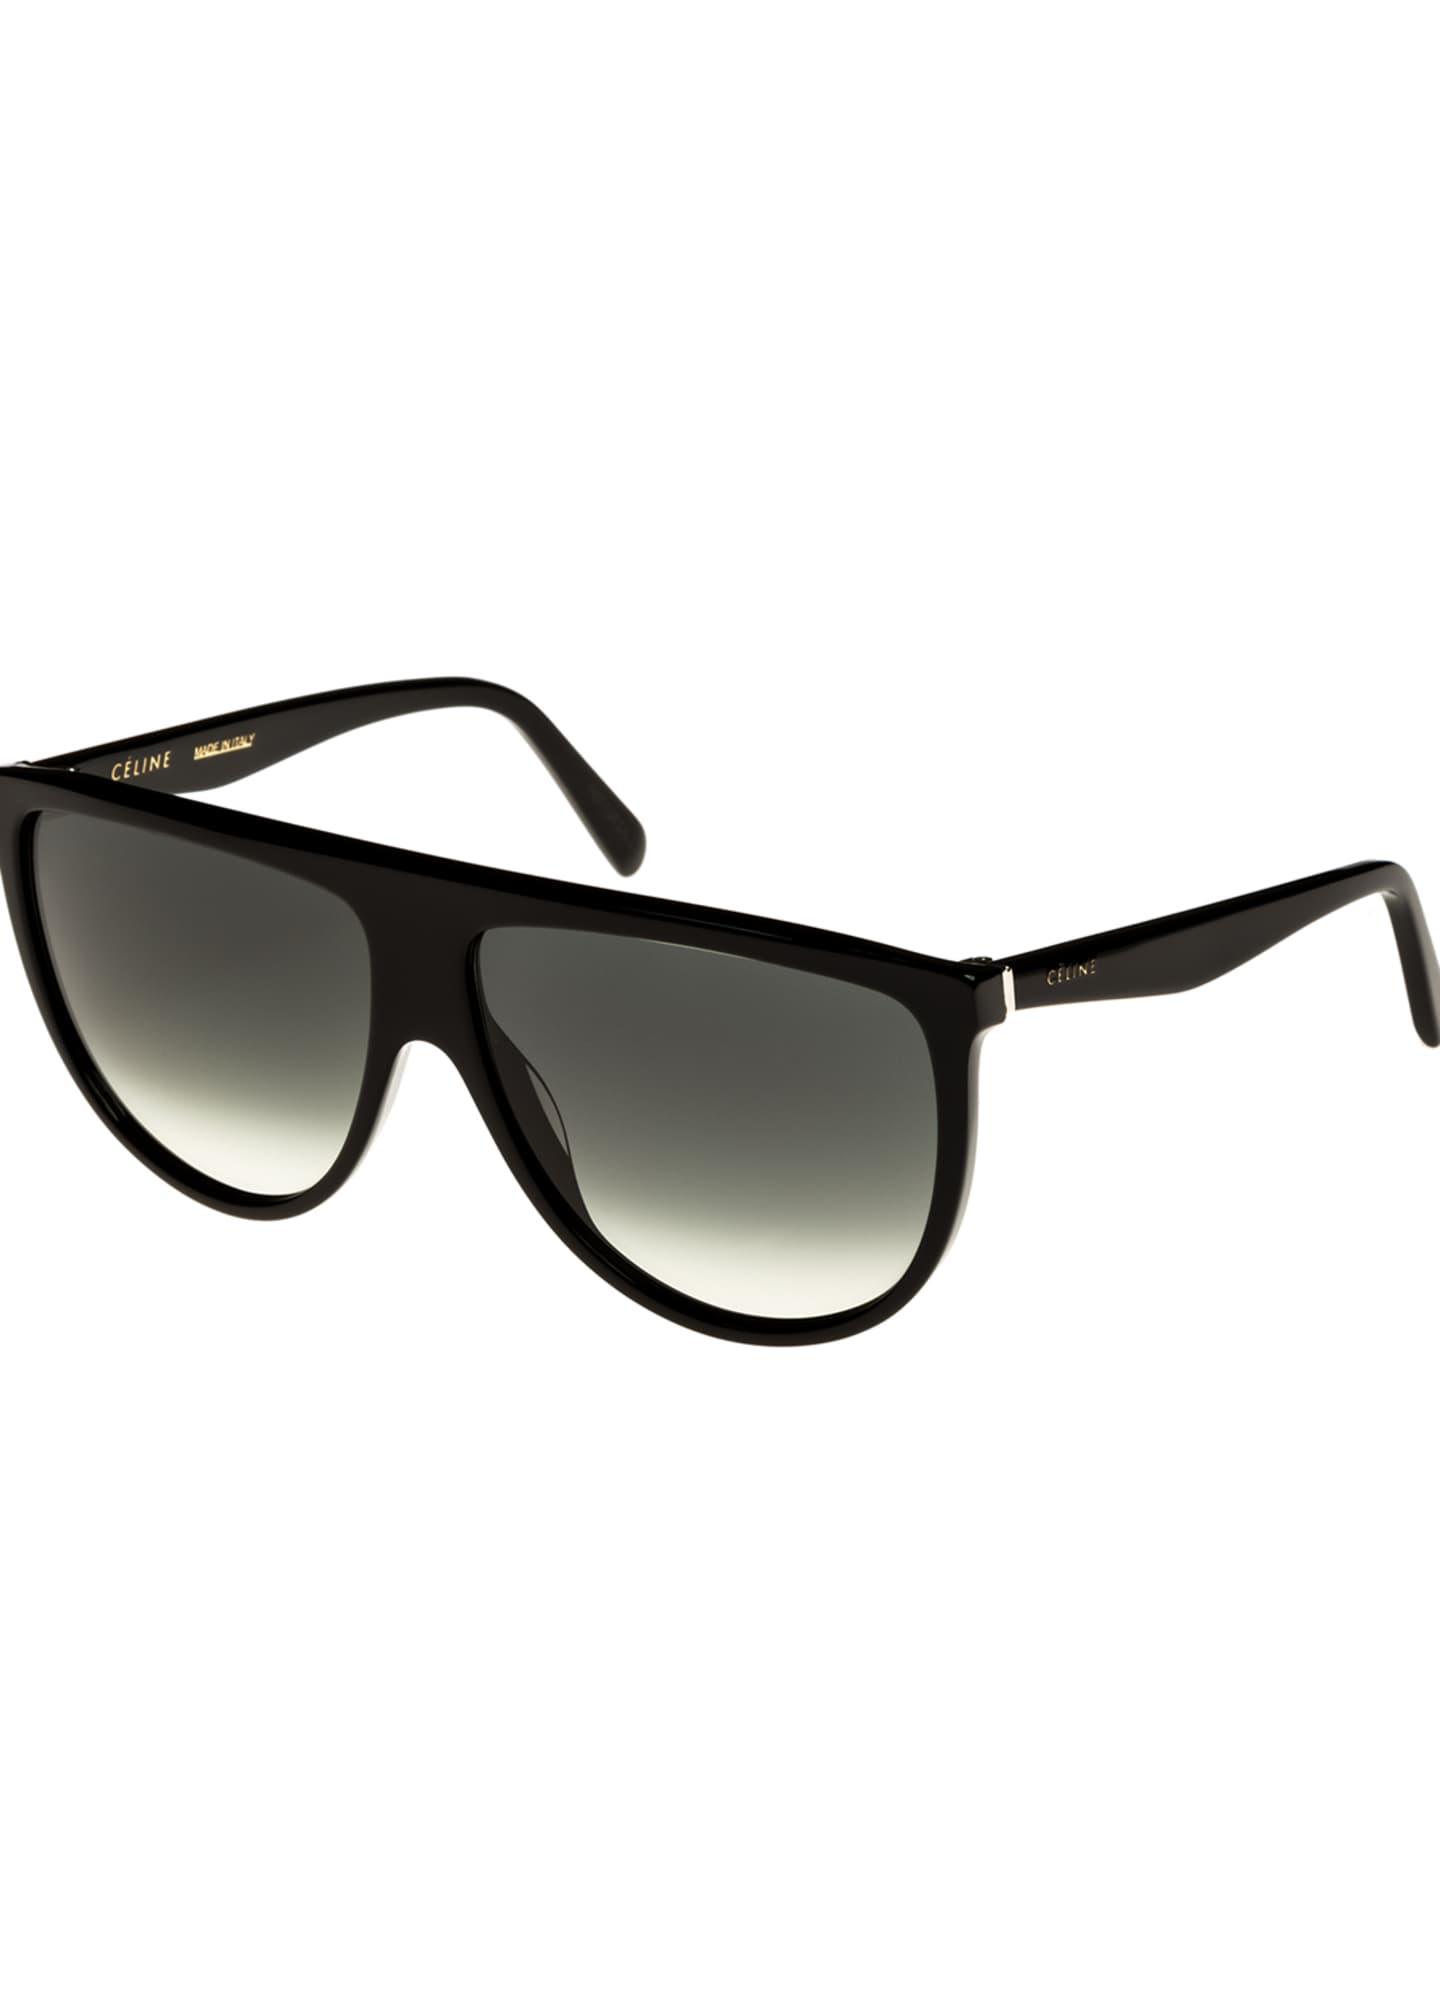 Celine Flattop Gradient Shield Sunglasses